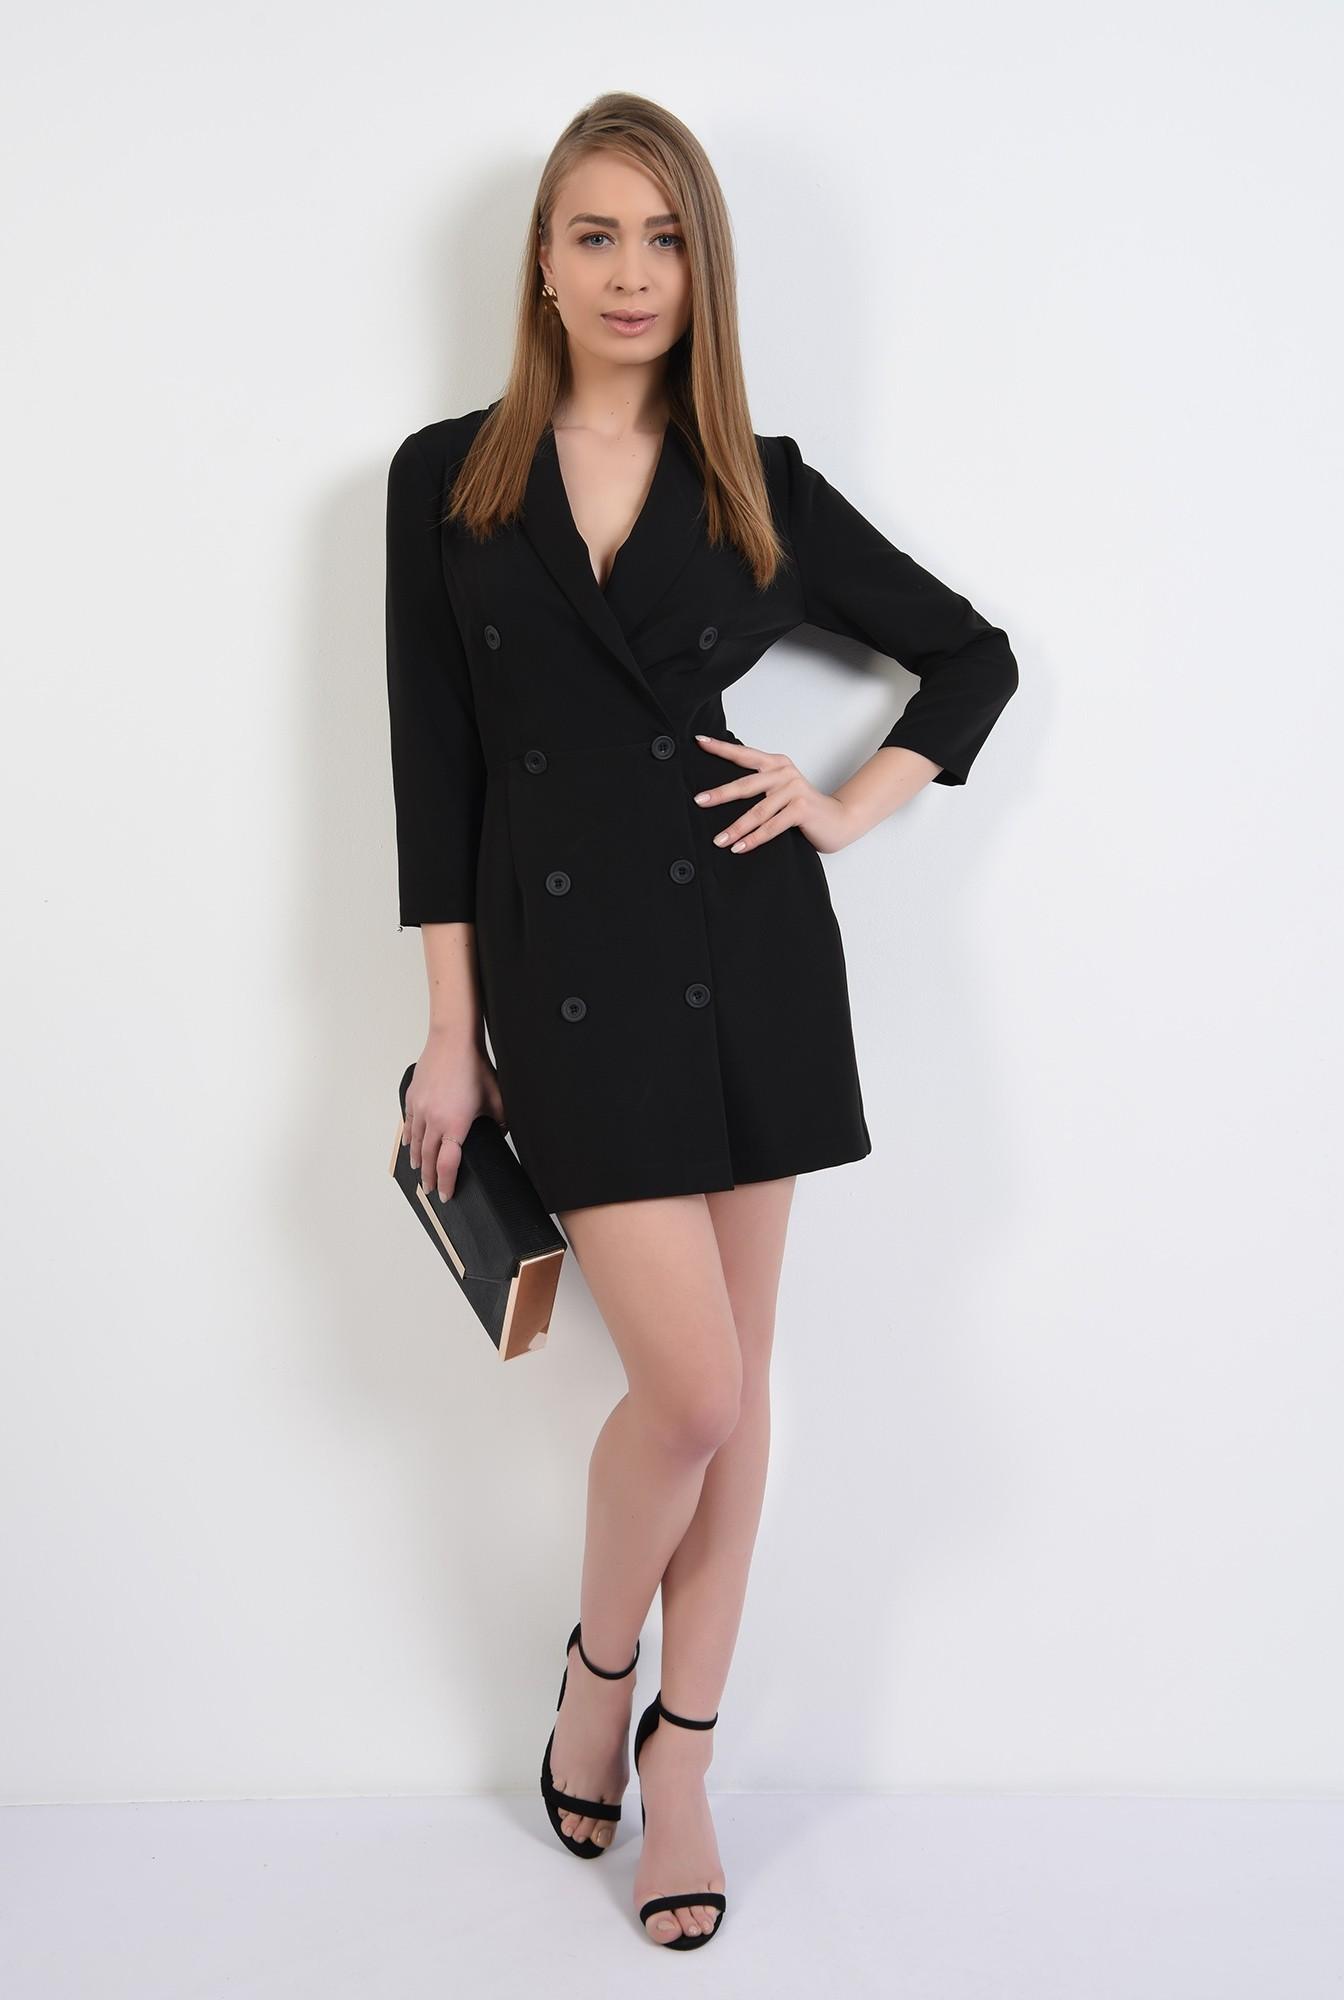 3 - rochie blazer, neagra, scurta, doua randuri de nasturi, revere